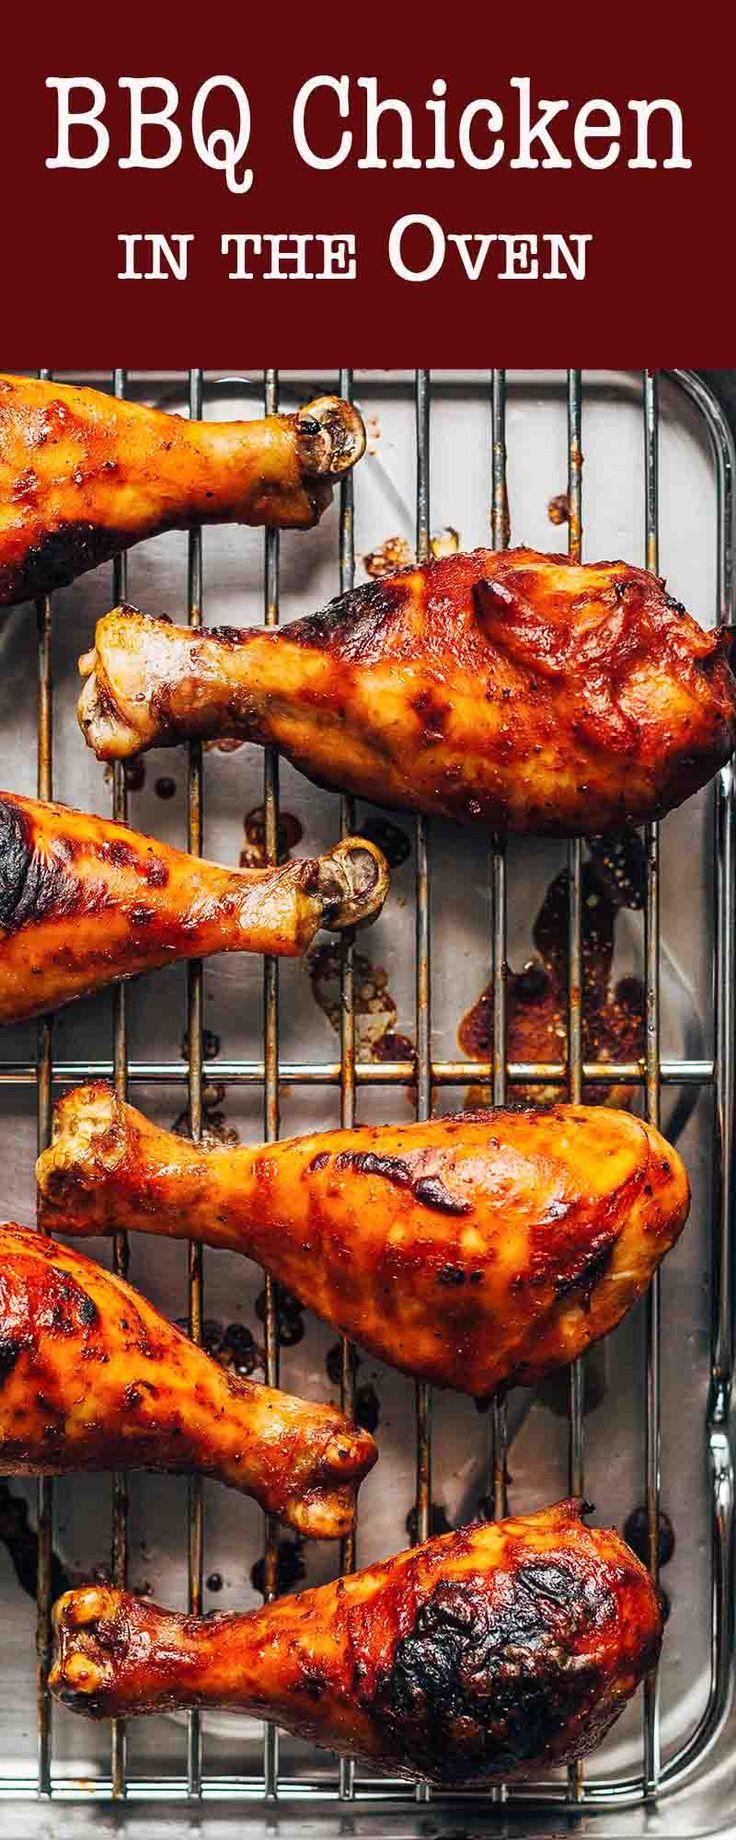 Best 20+ Chicken legs in oven ideas on Pinterest | Oven baked ...